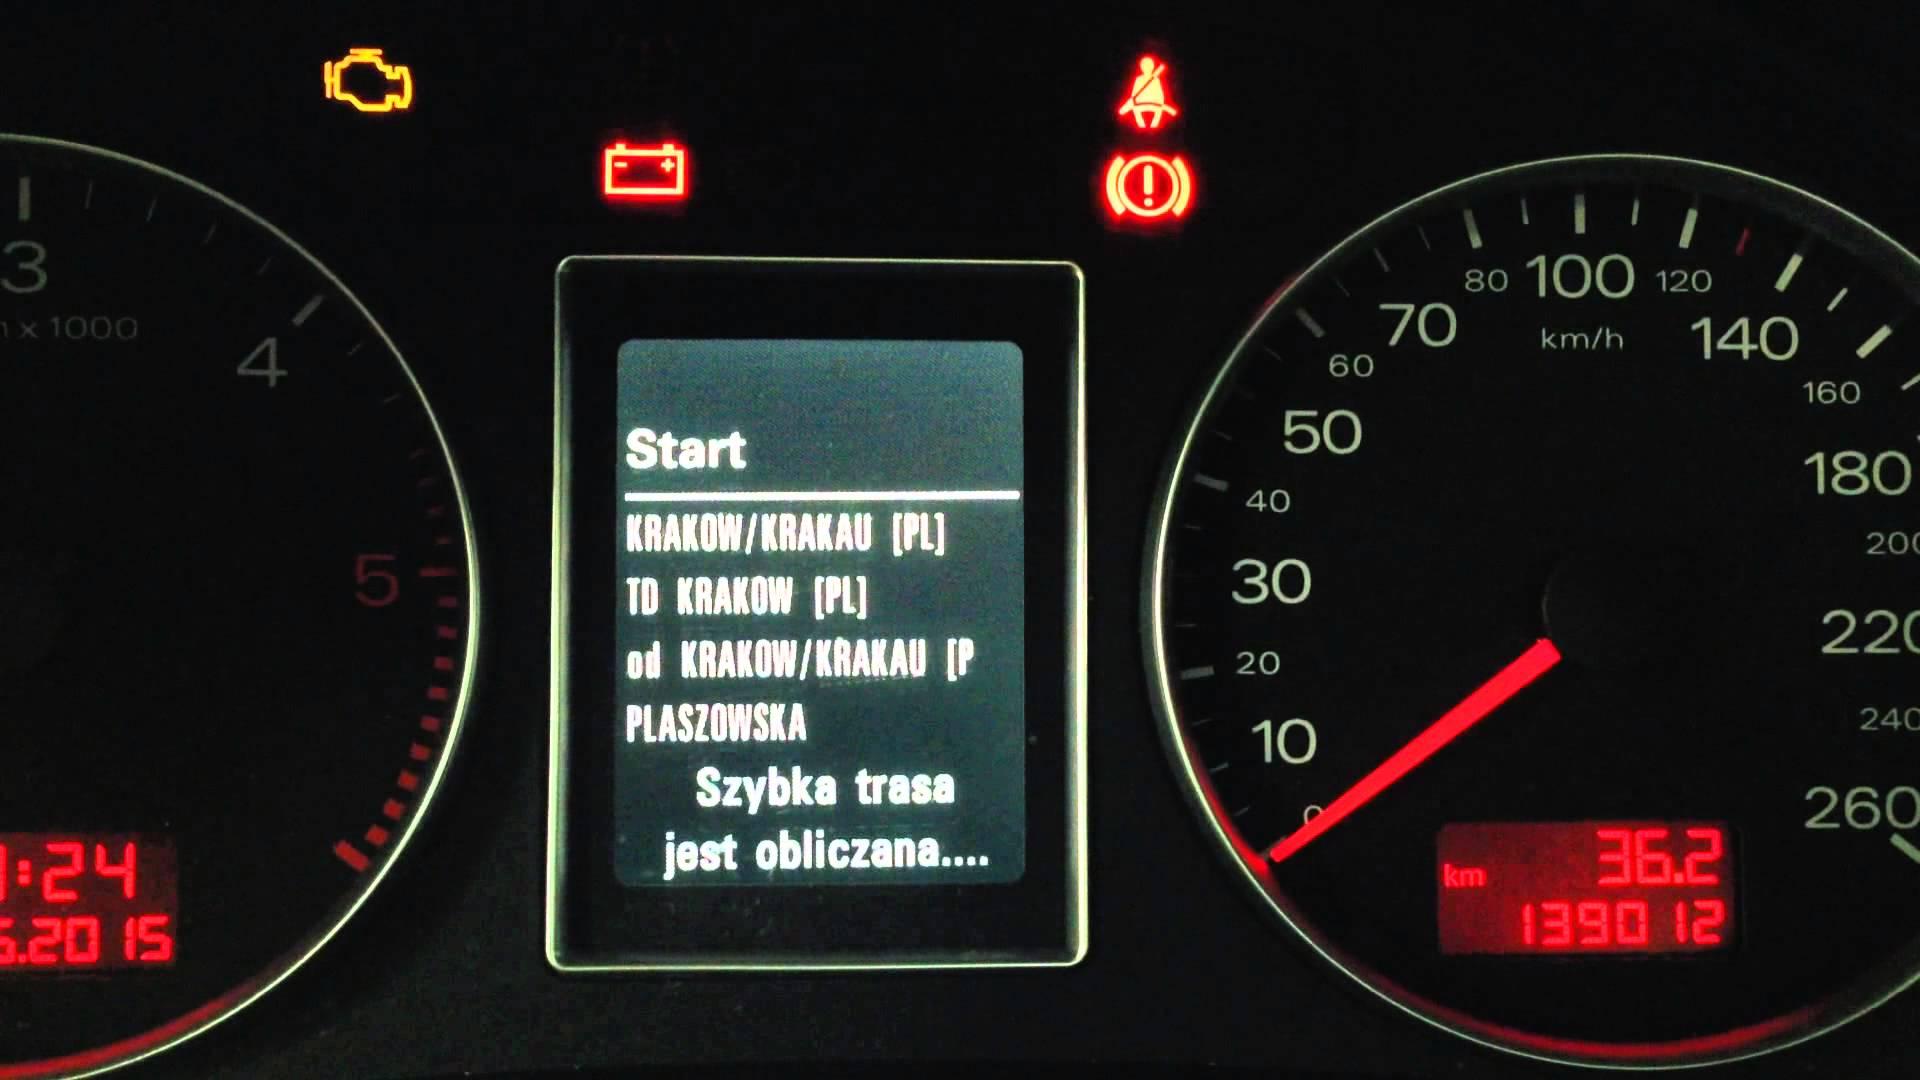 Polskie Menu Lektor Audi Mmi2g Rnse D Fis Mapa 18 7500799796